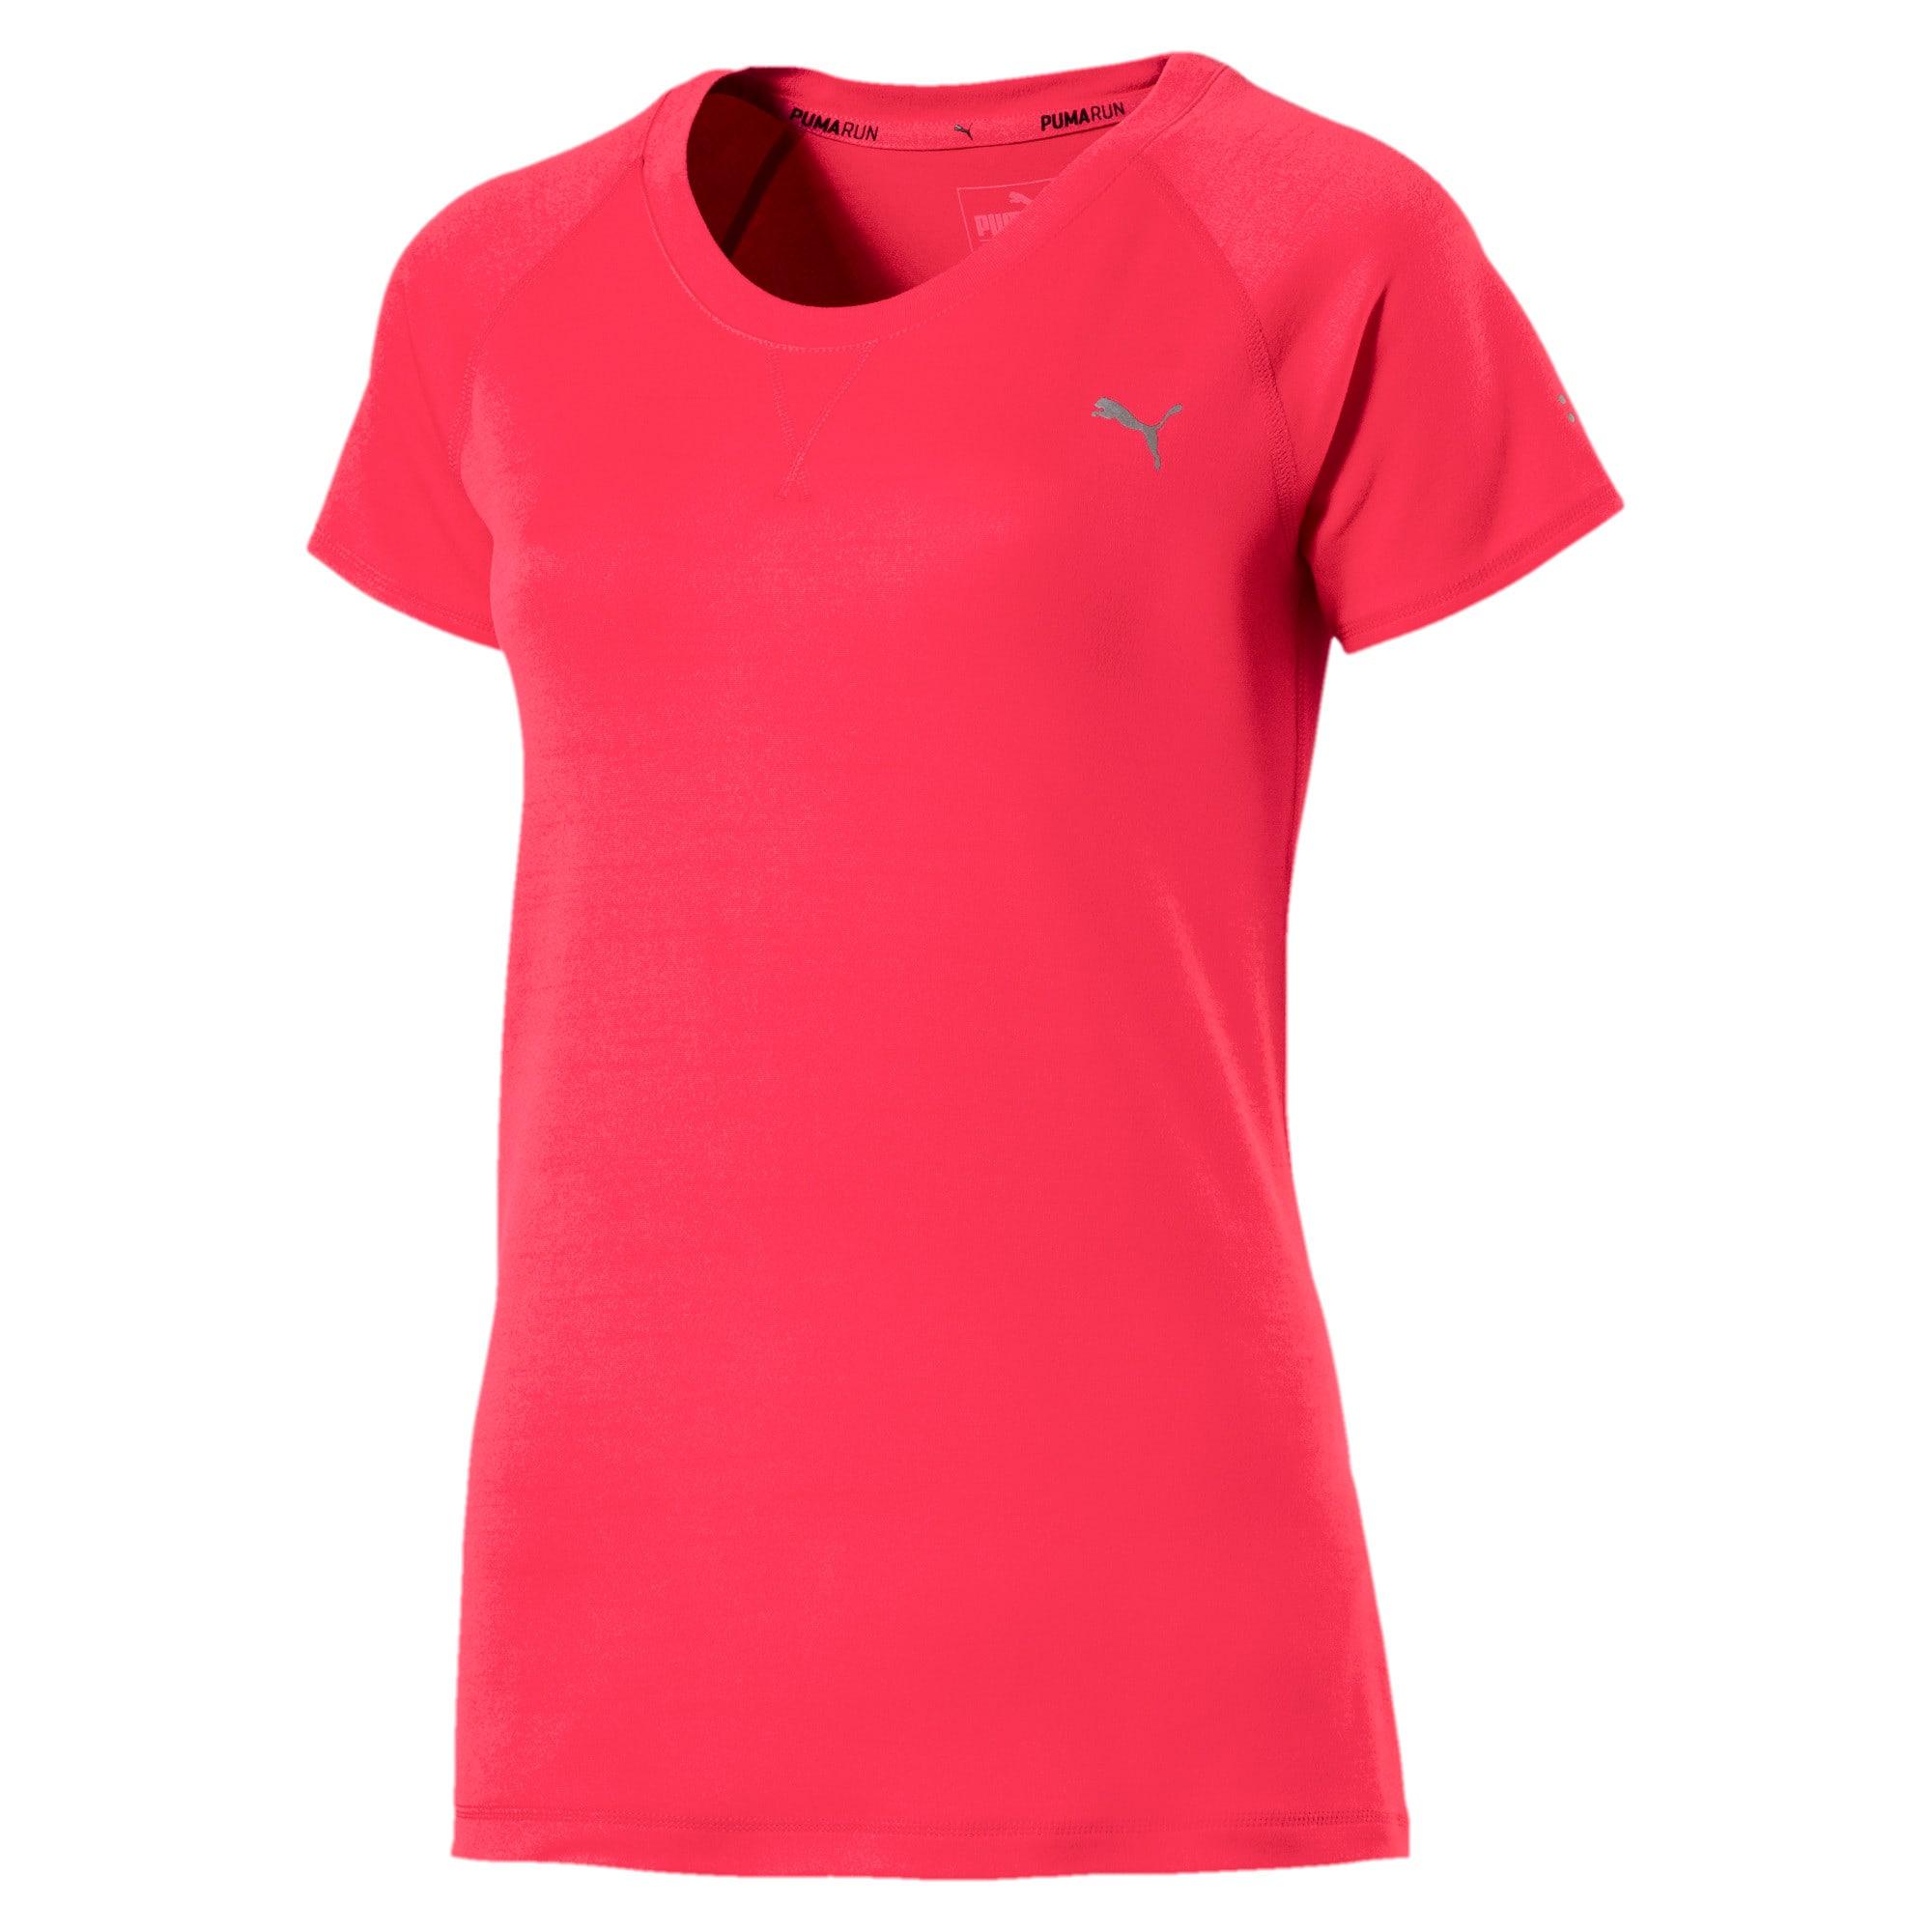 Thumbnail 1 of Epic Short Sleeve Women's Training Top, Paradise Pink Heather, medium-IND